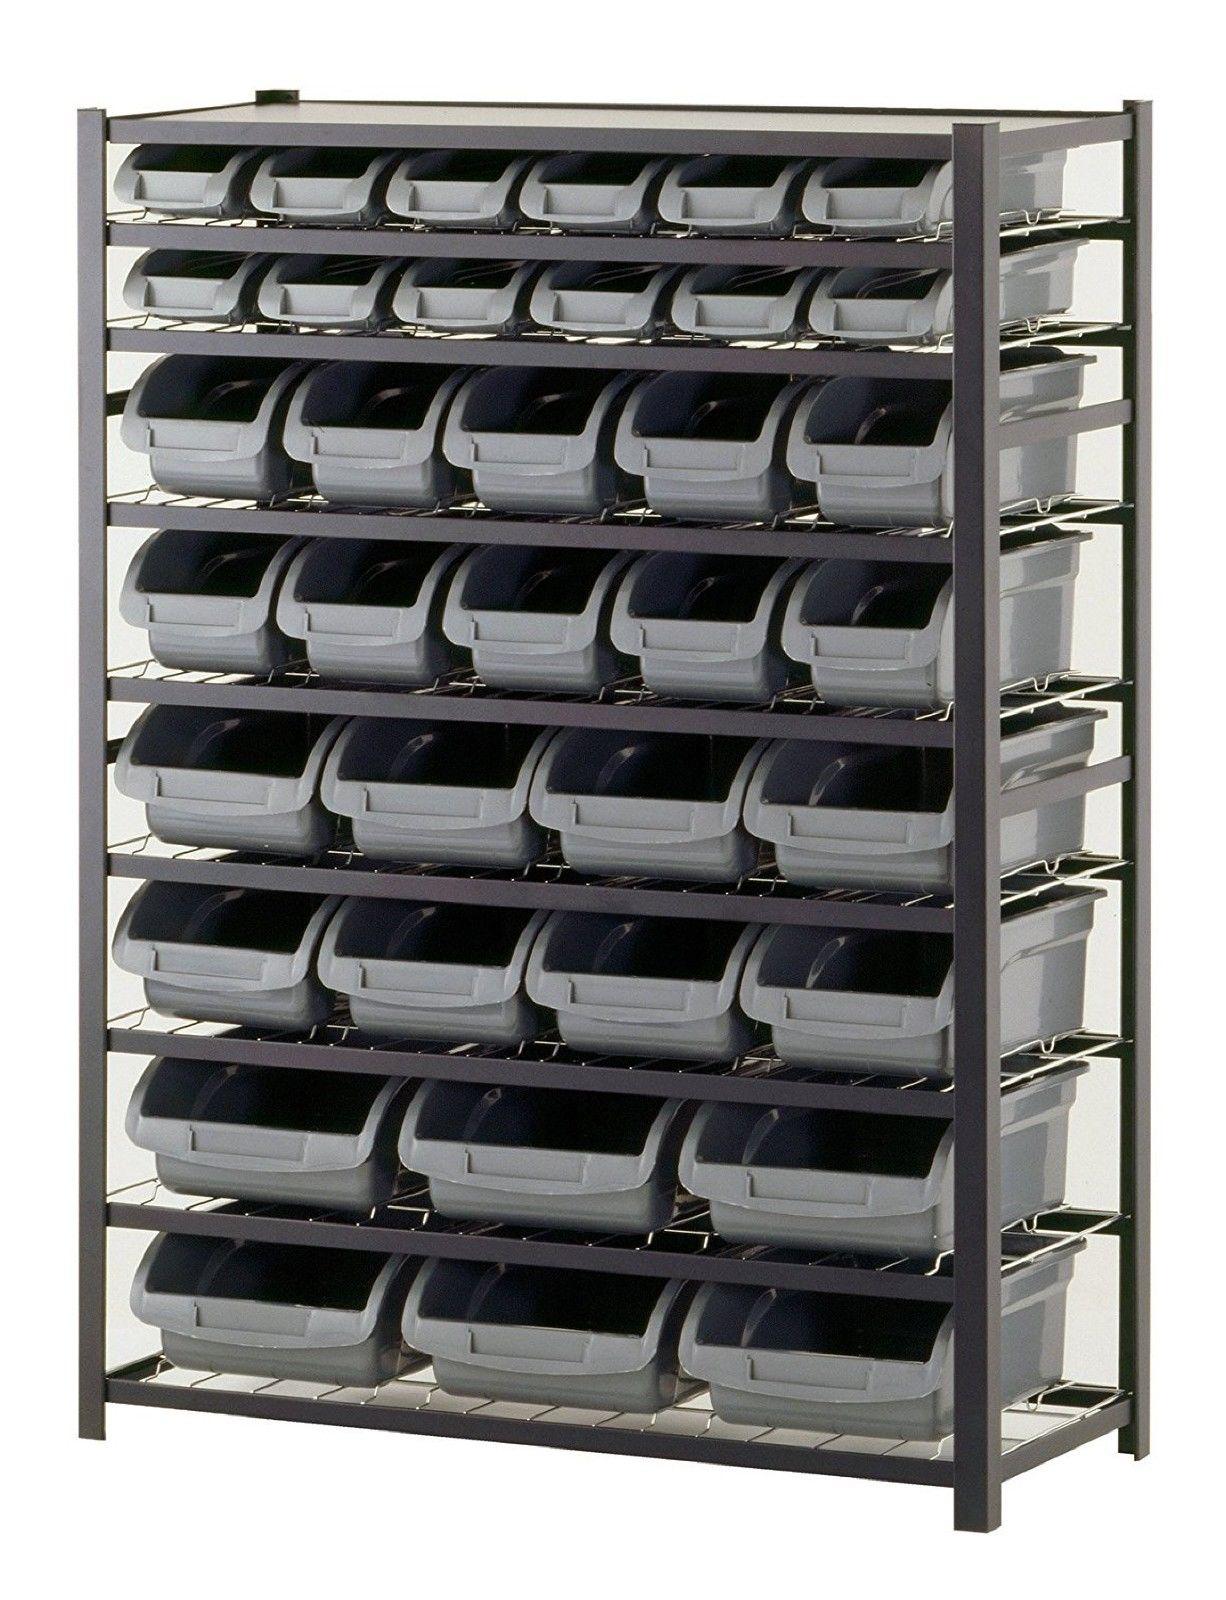 Storage Unit Units Food Dog Food Large Heavy Duty Black Metal Rack Shelf 36 Bin 1